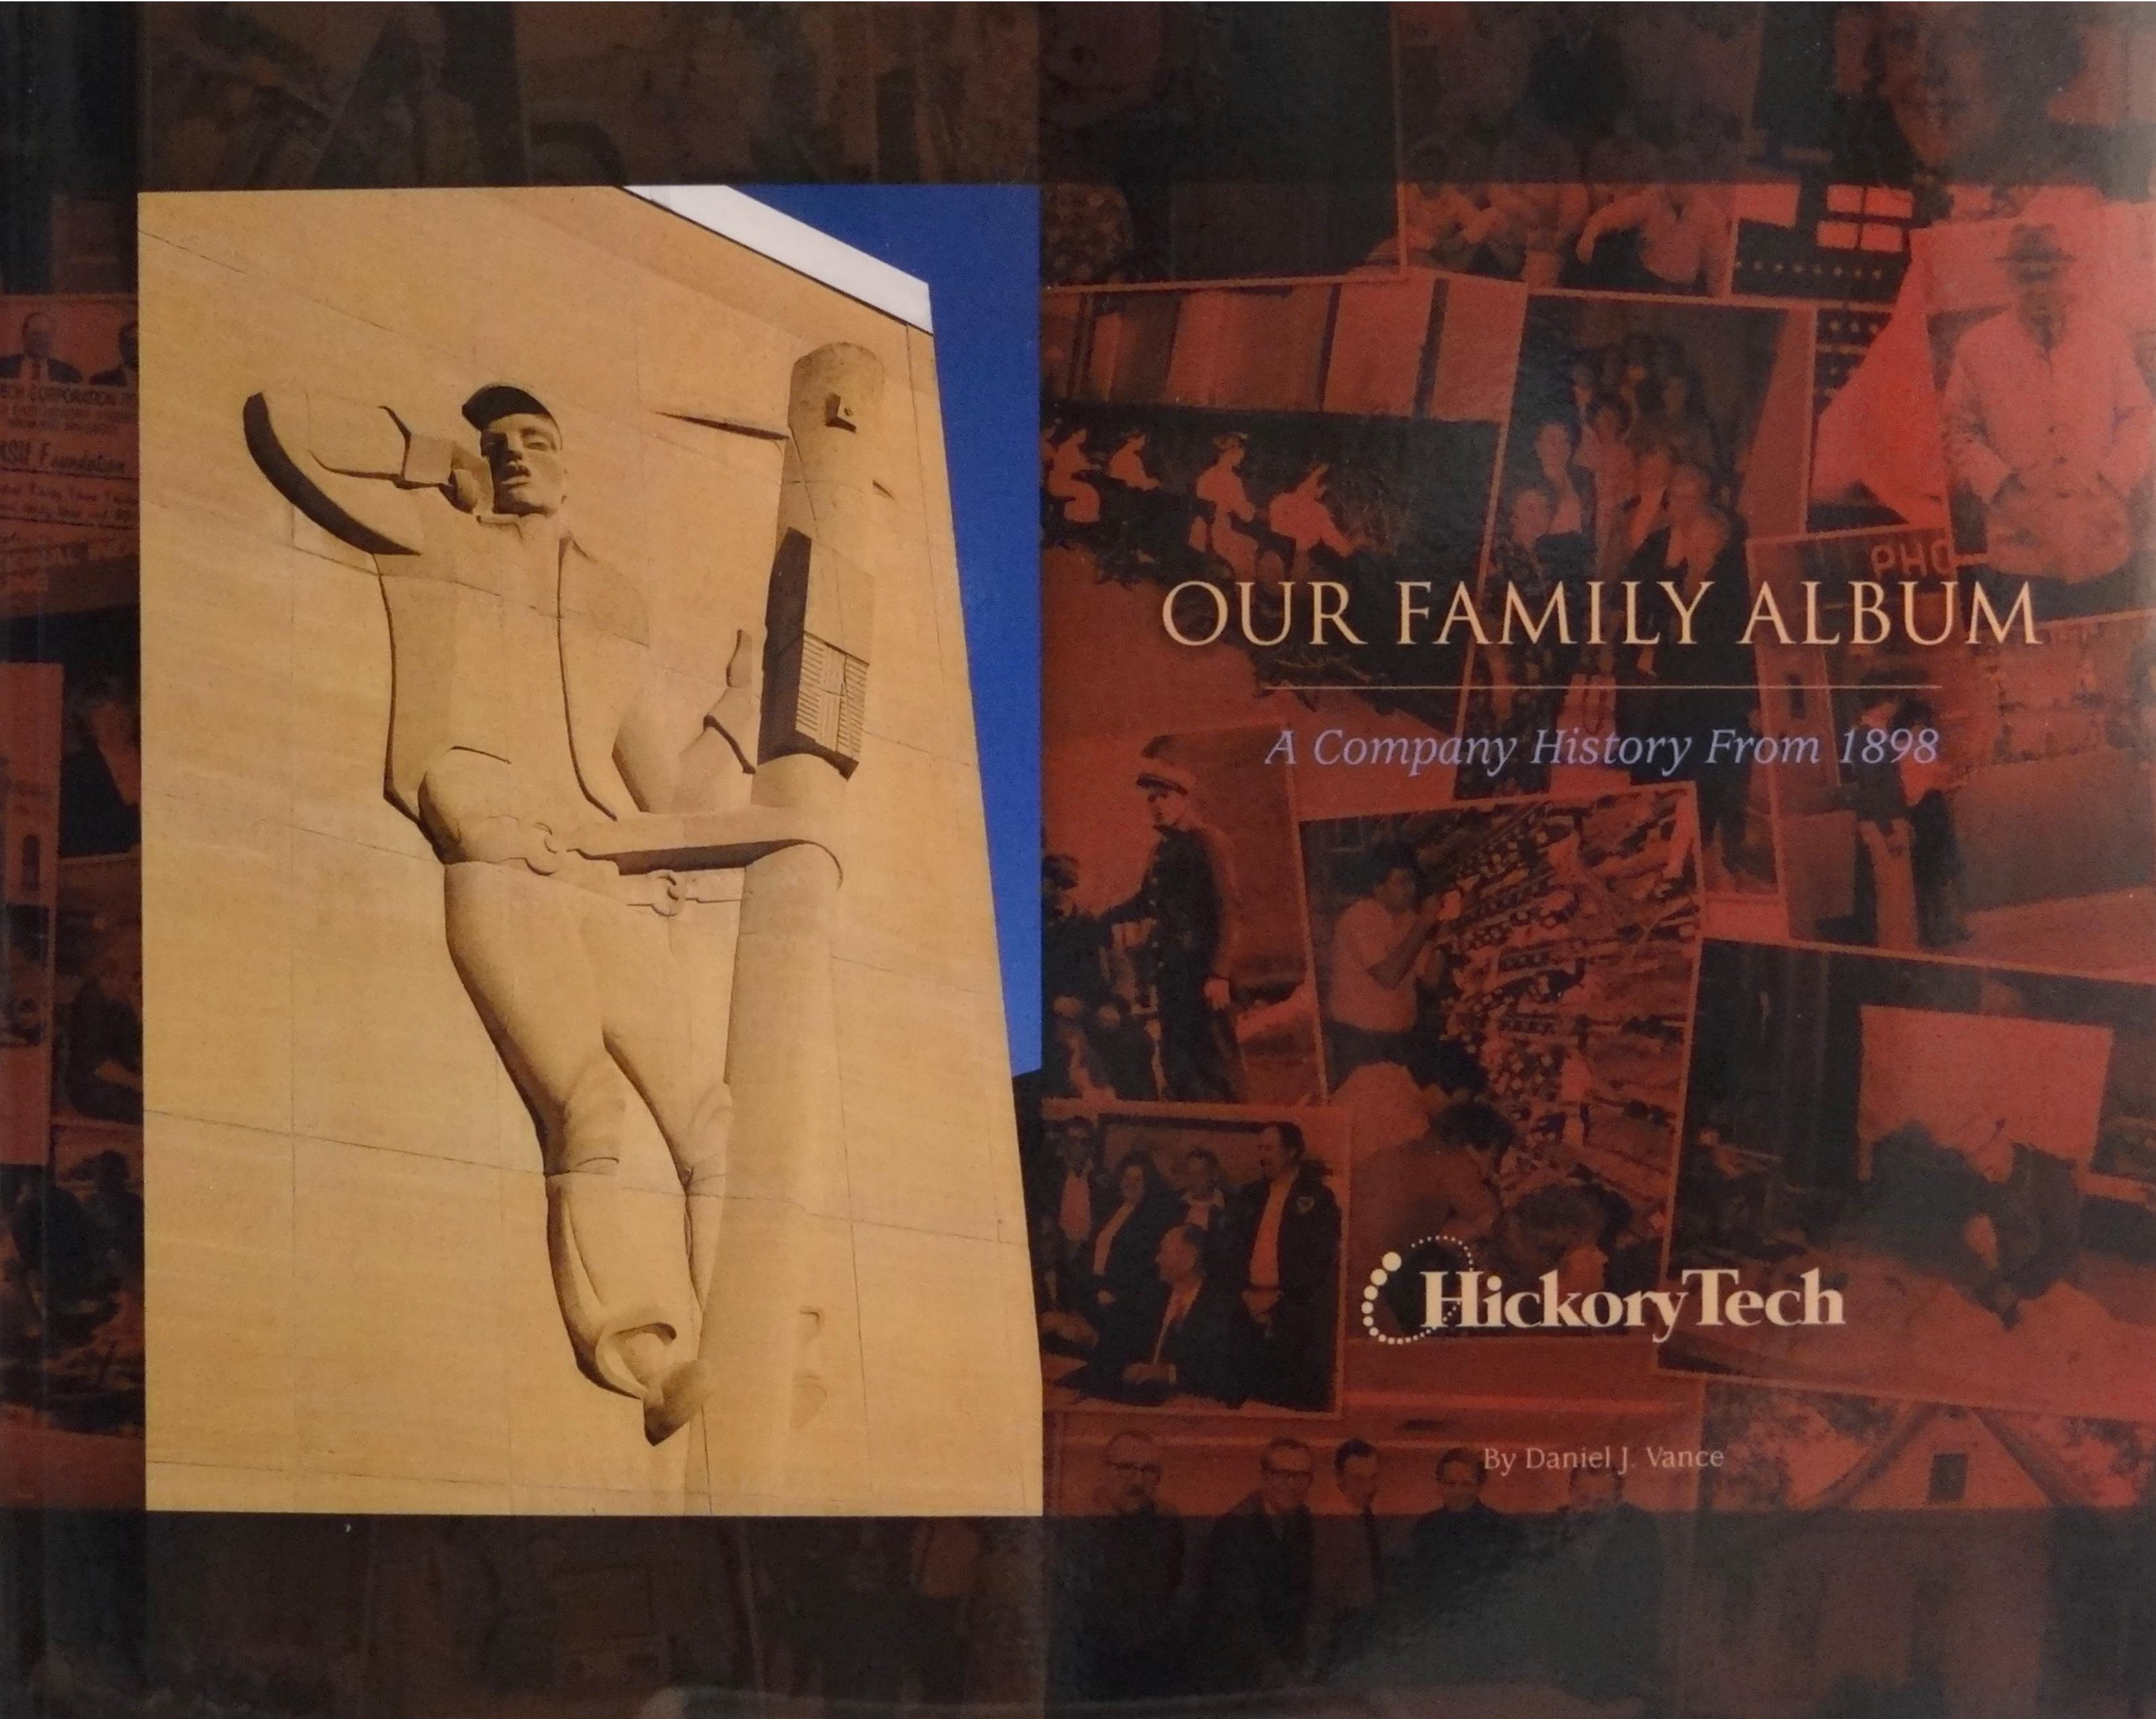 Our Family Album - HickoryTech Image